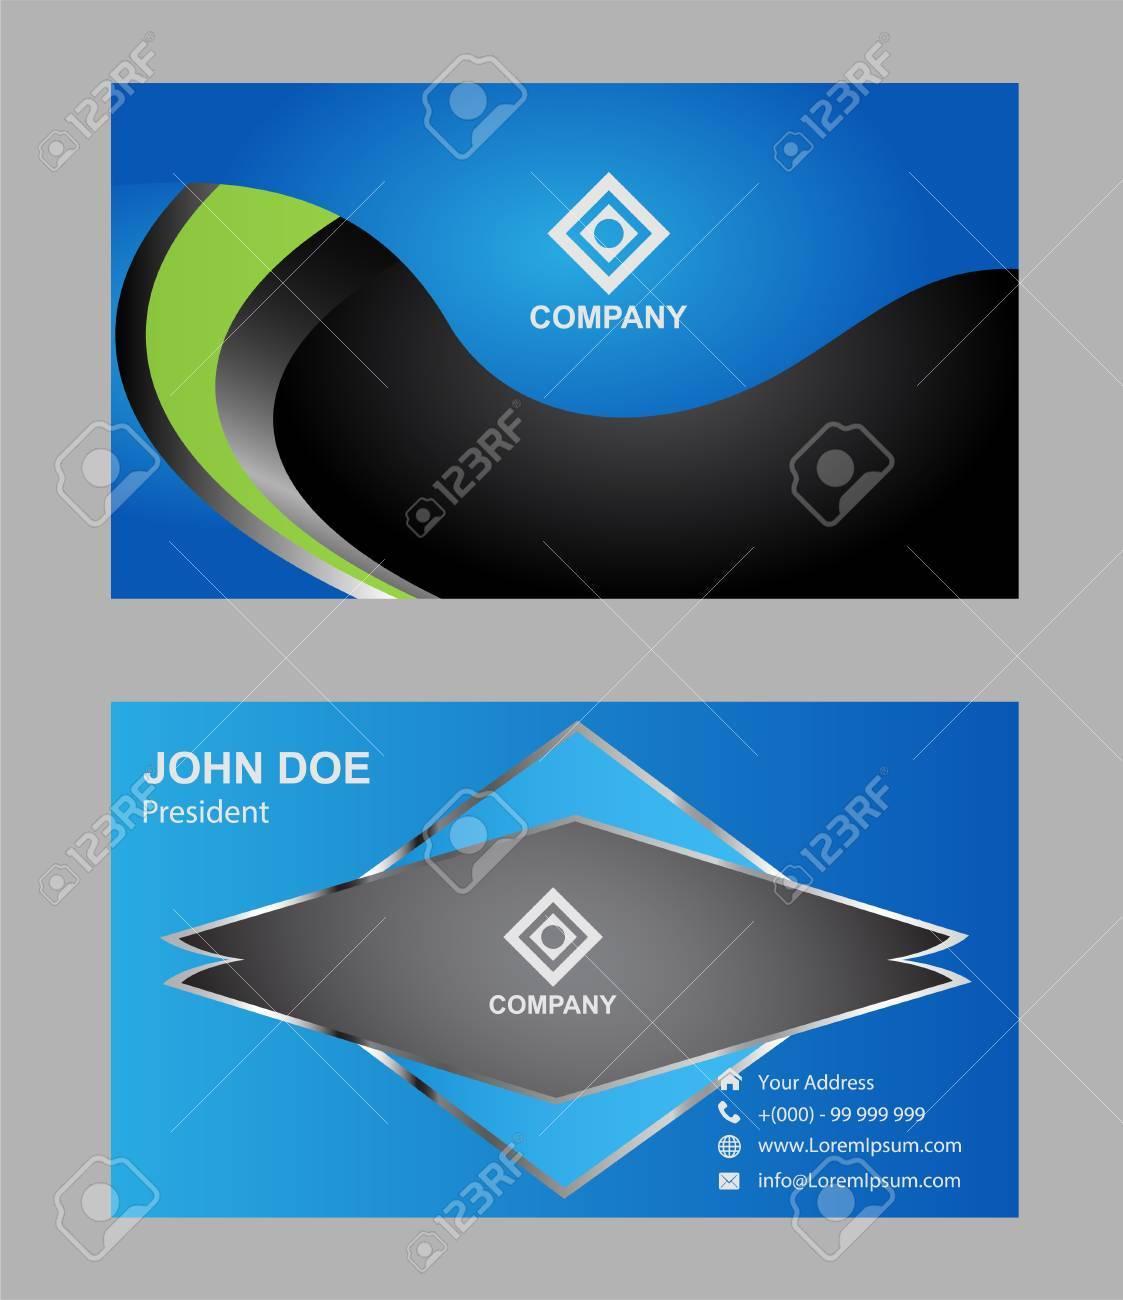 Modern simple luxury standard business card design with sharp modern simple luxury standard business card design with sharp corners stock vector 56240536 colourmoves